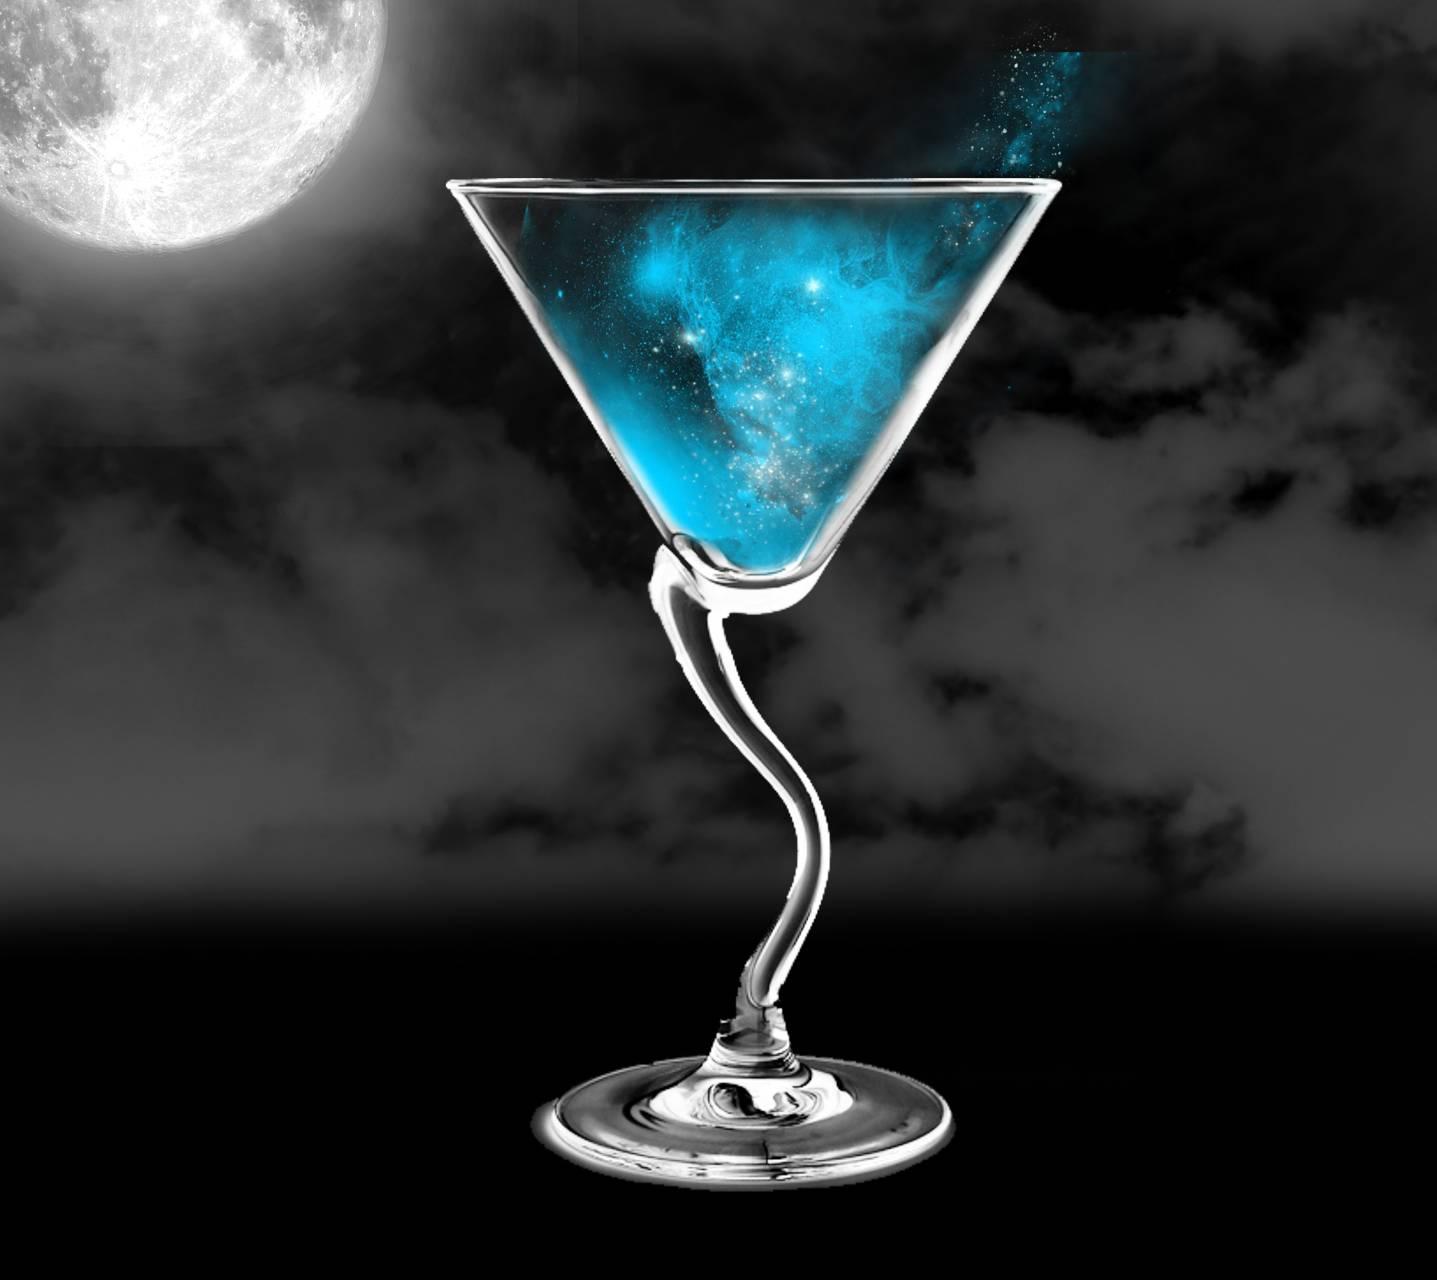 Galaxy Martini